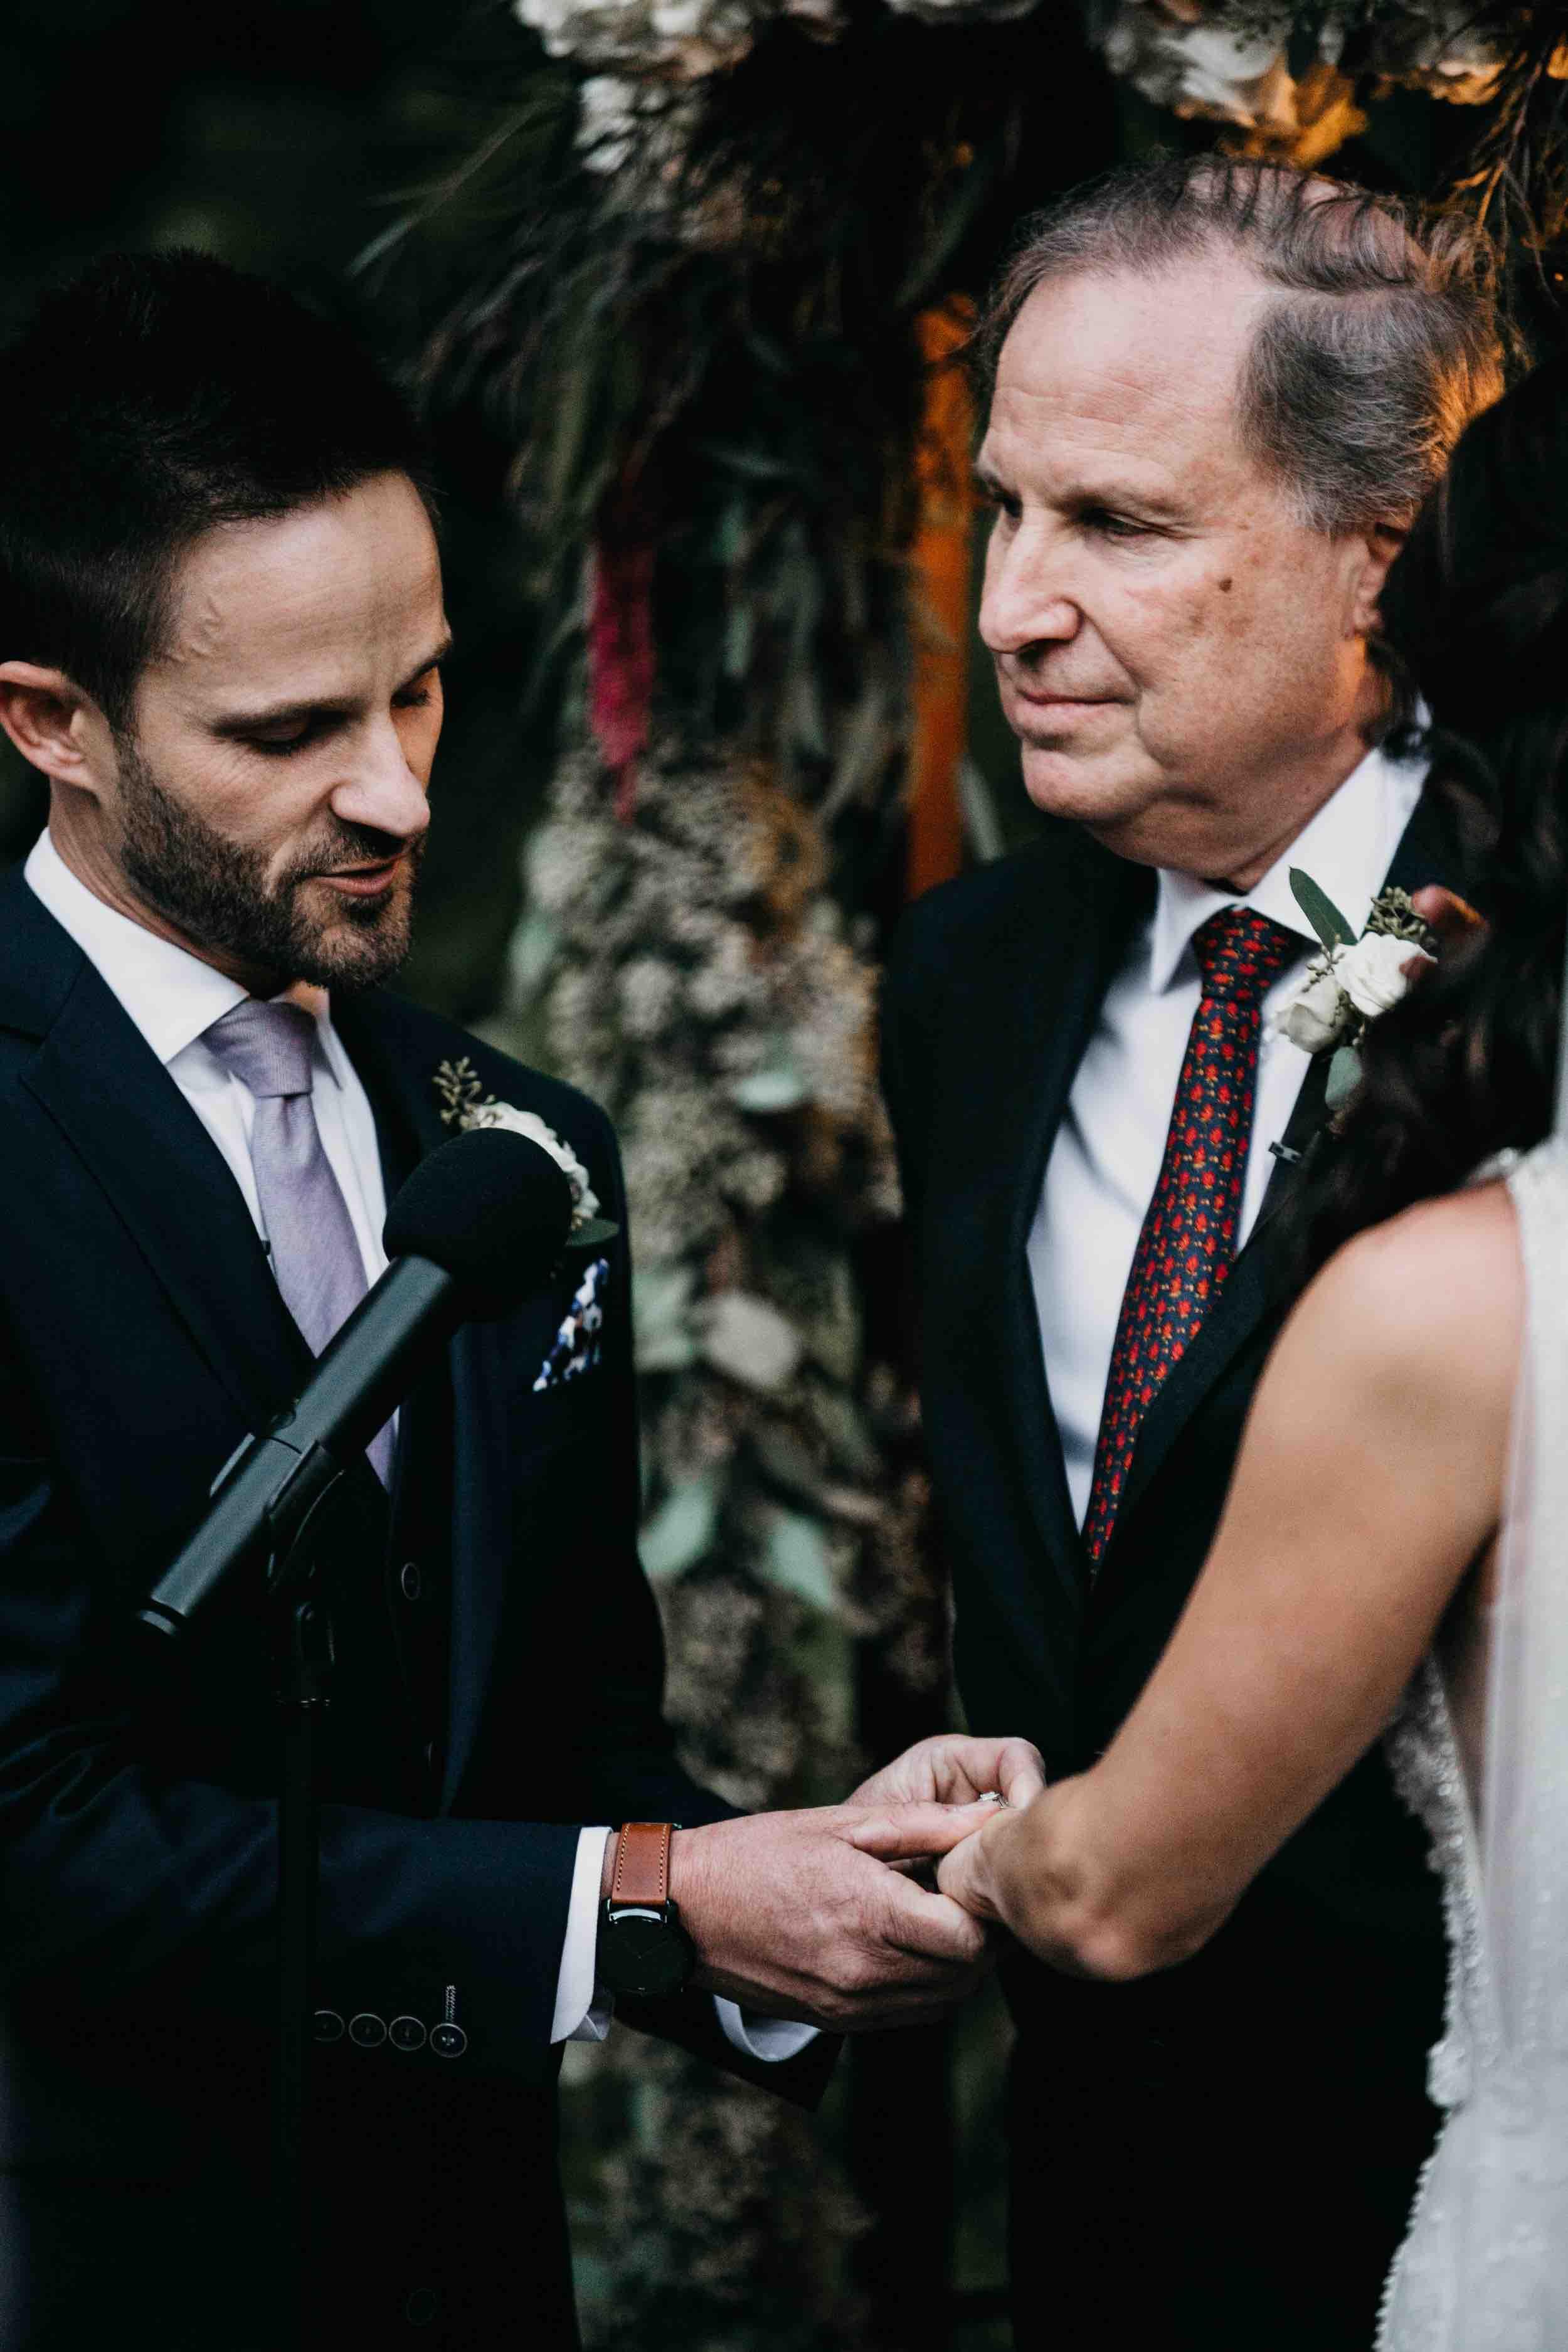 Laura&Don_Ceremony166.jpeg